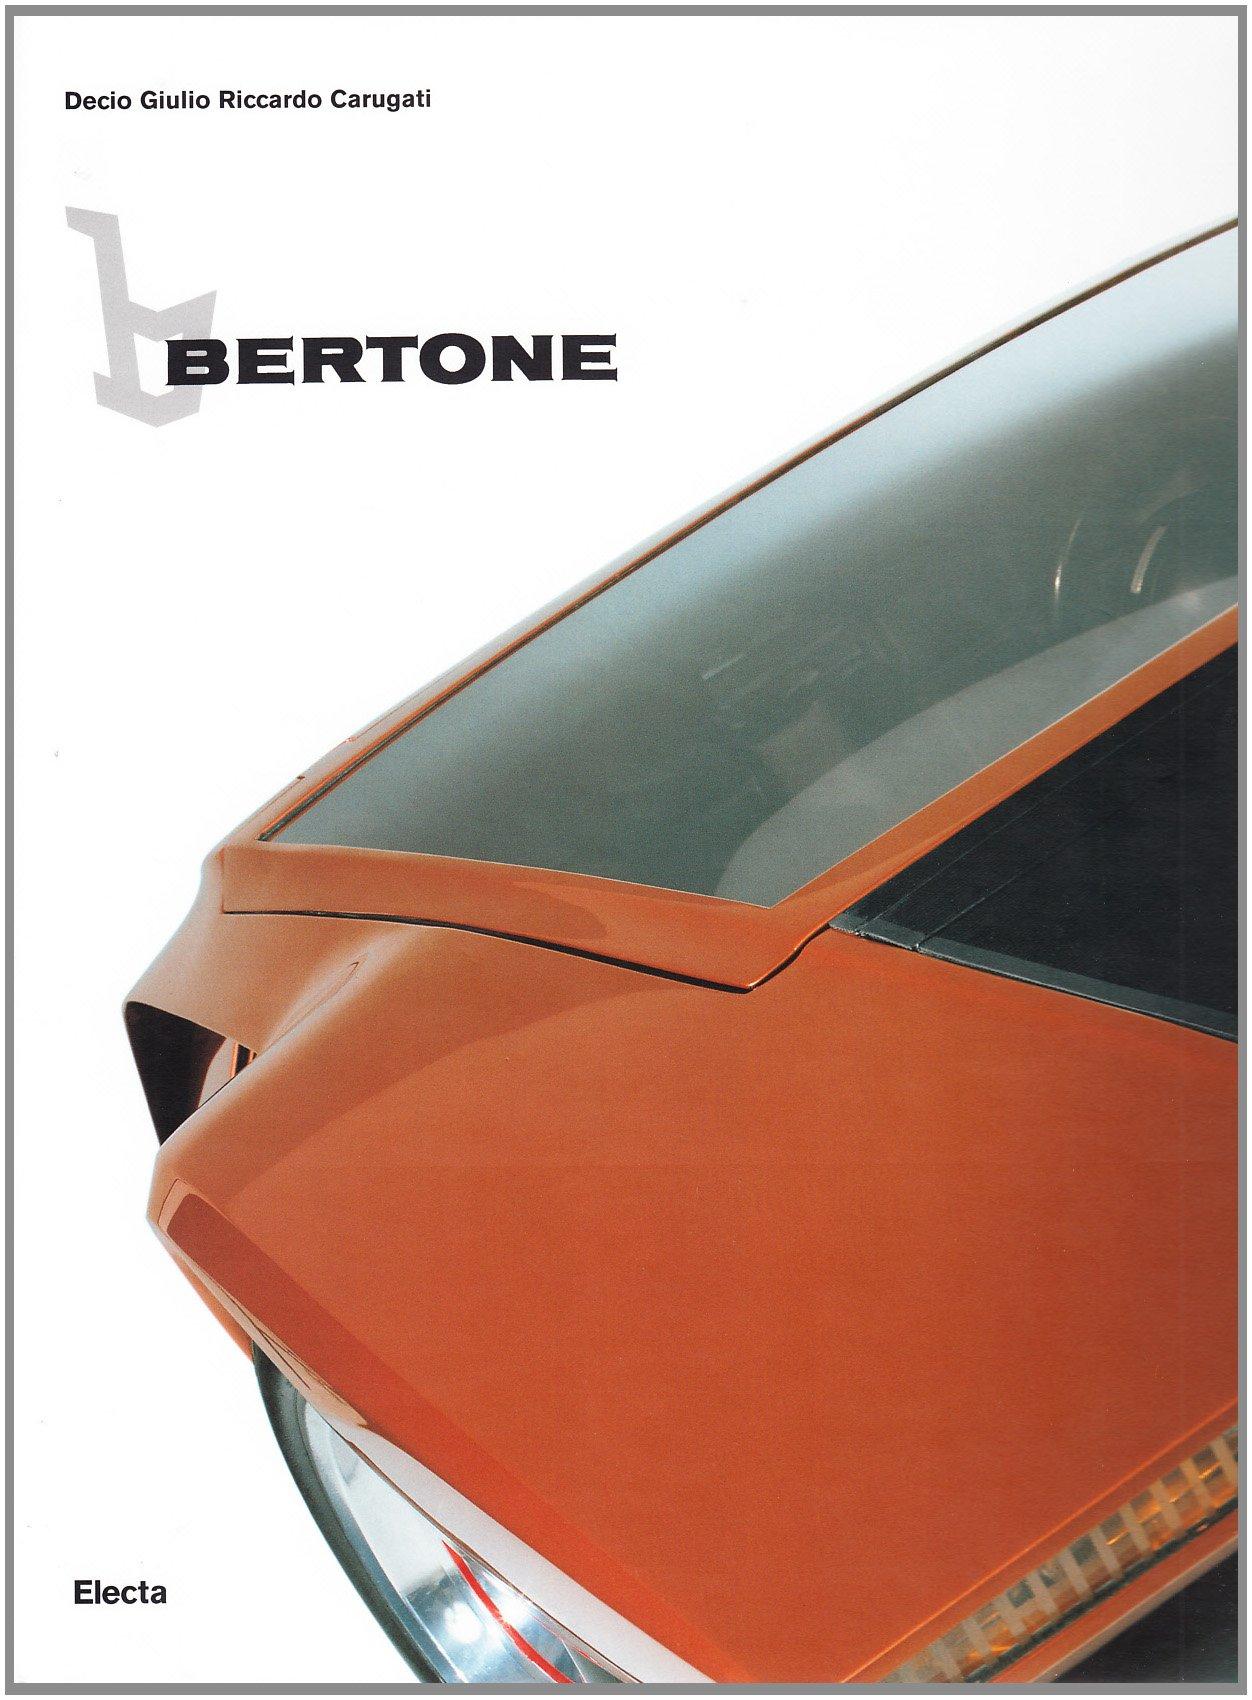 Bertone. Ediz. inglese (Industria e design)